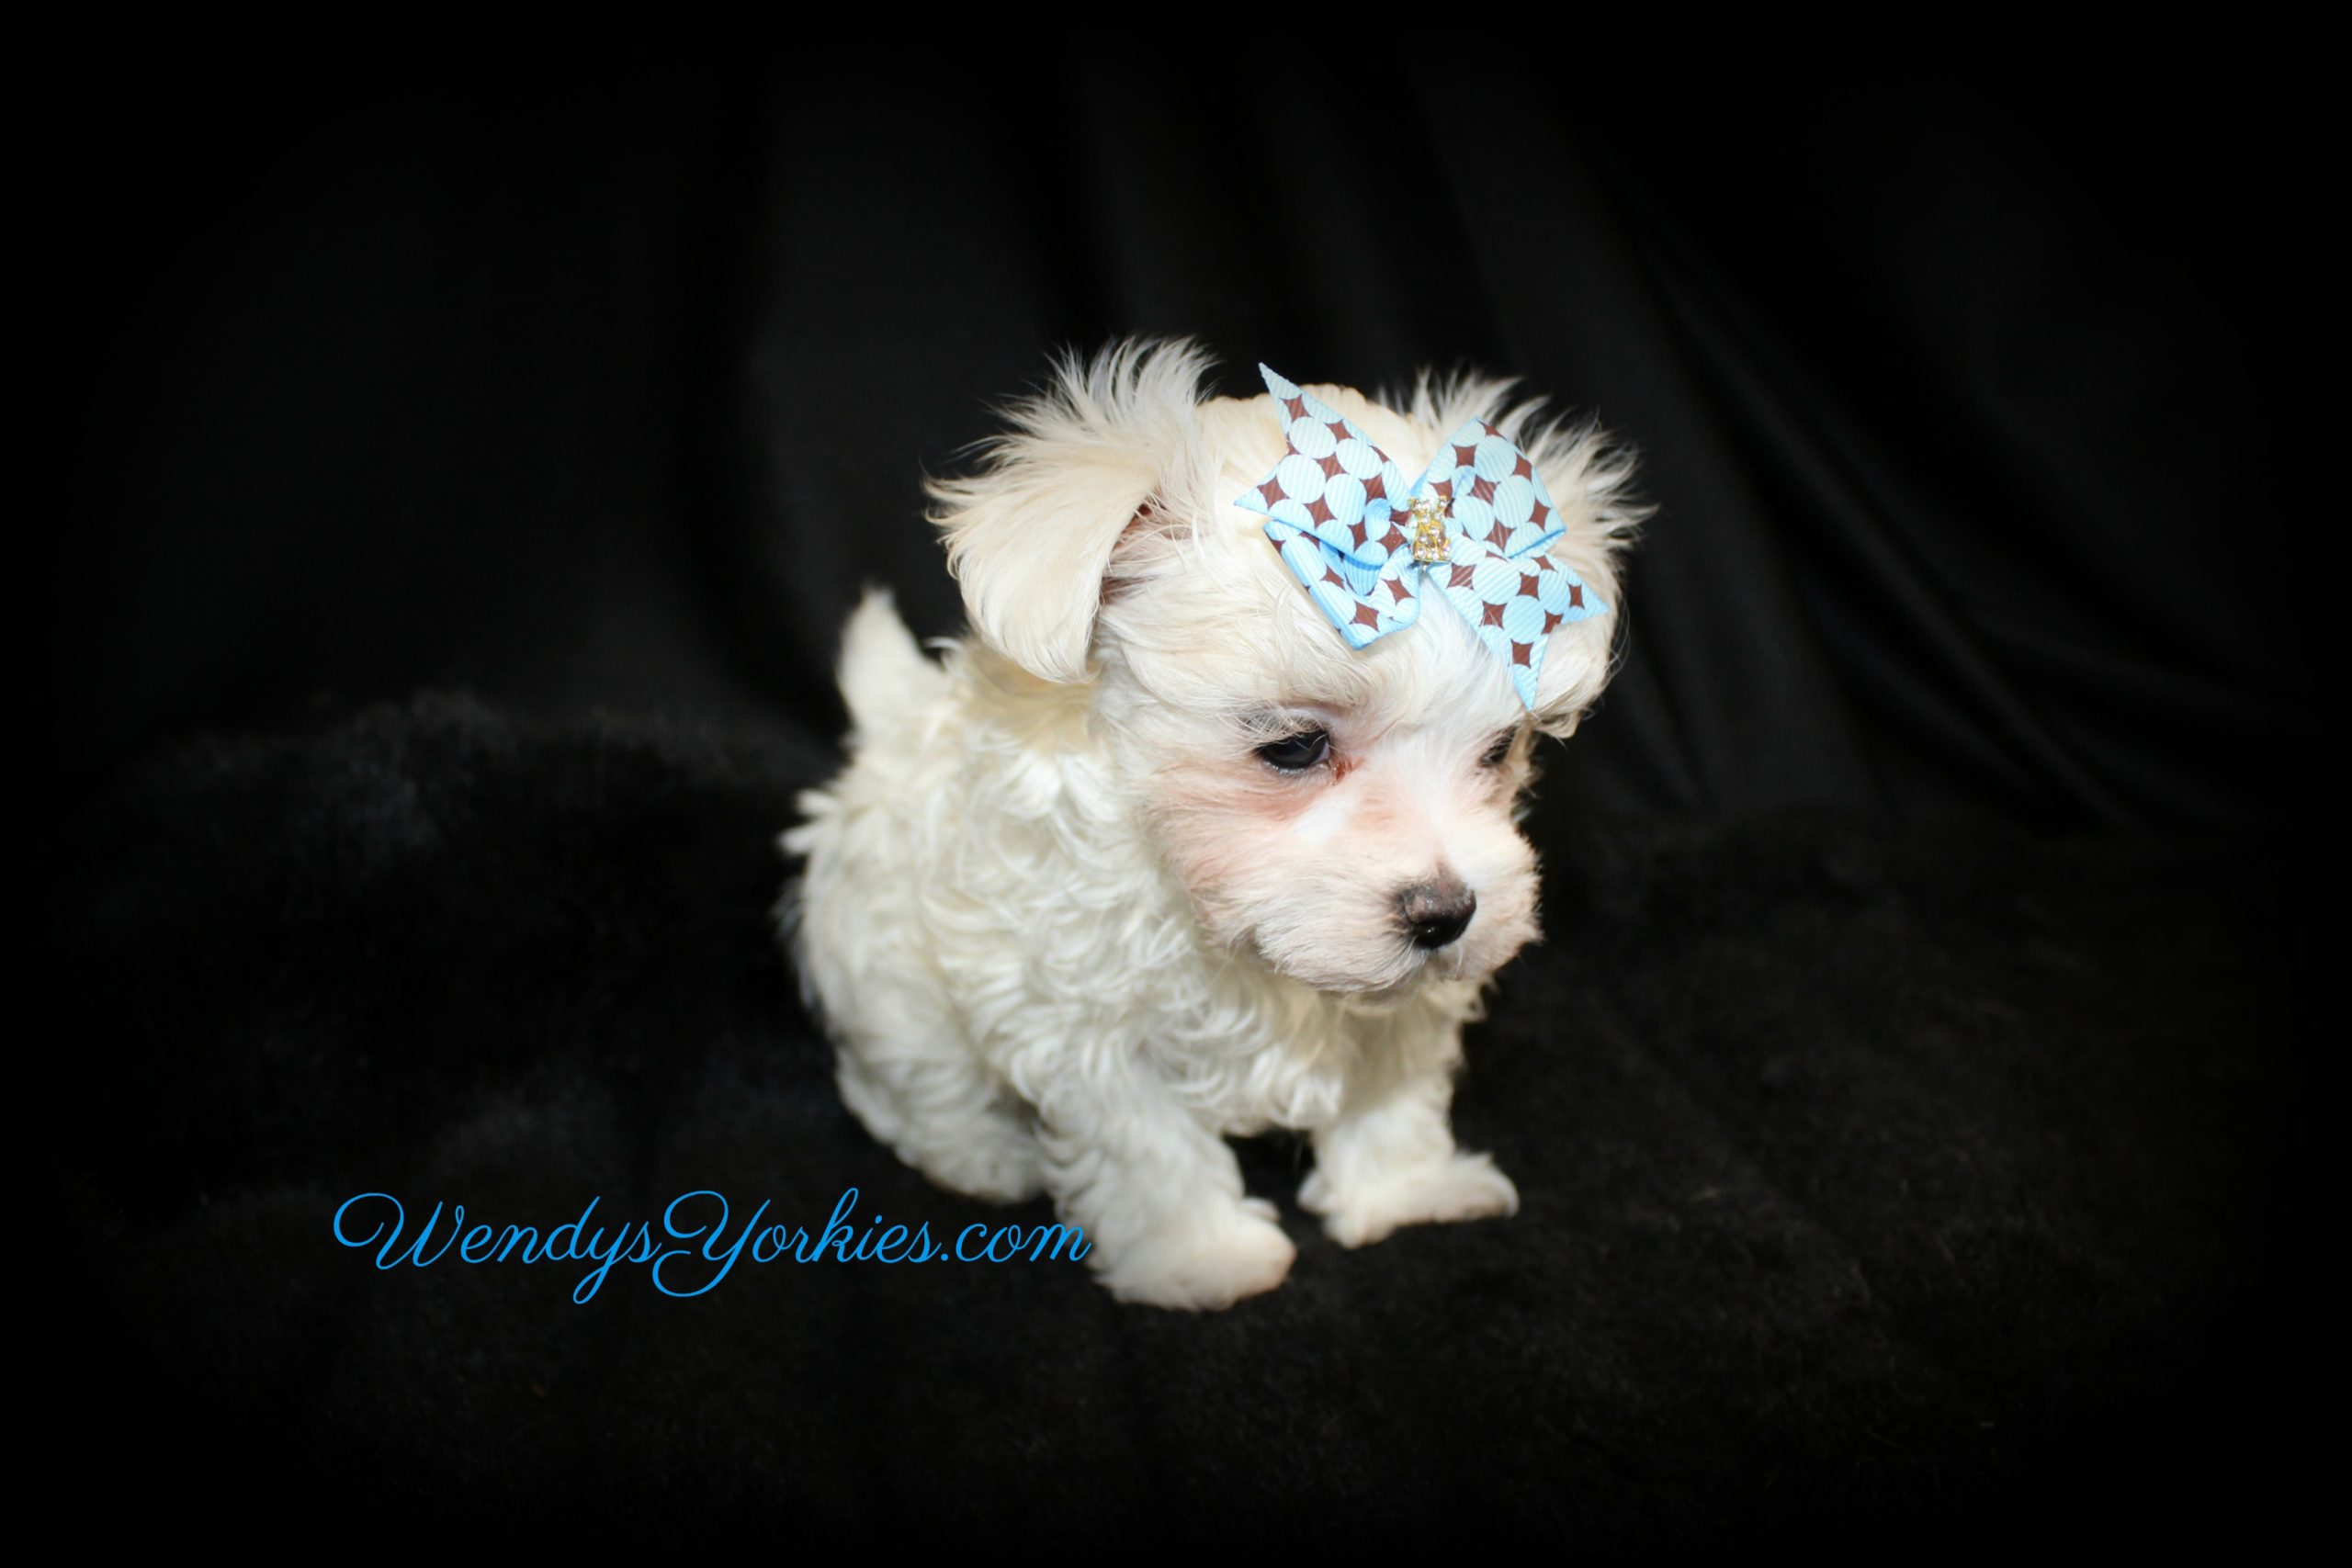 Teacup Maltese puppy for sale, Zeus, WendysYorkies.com